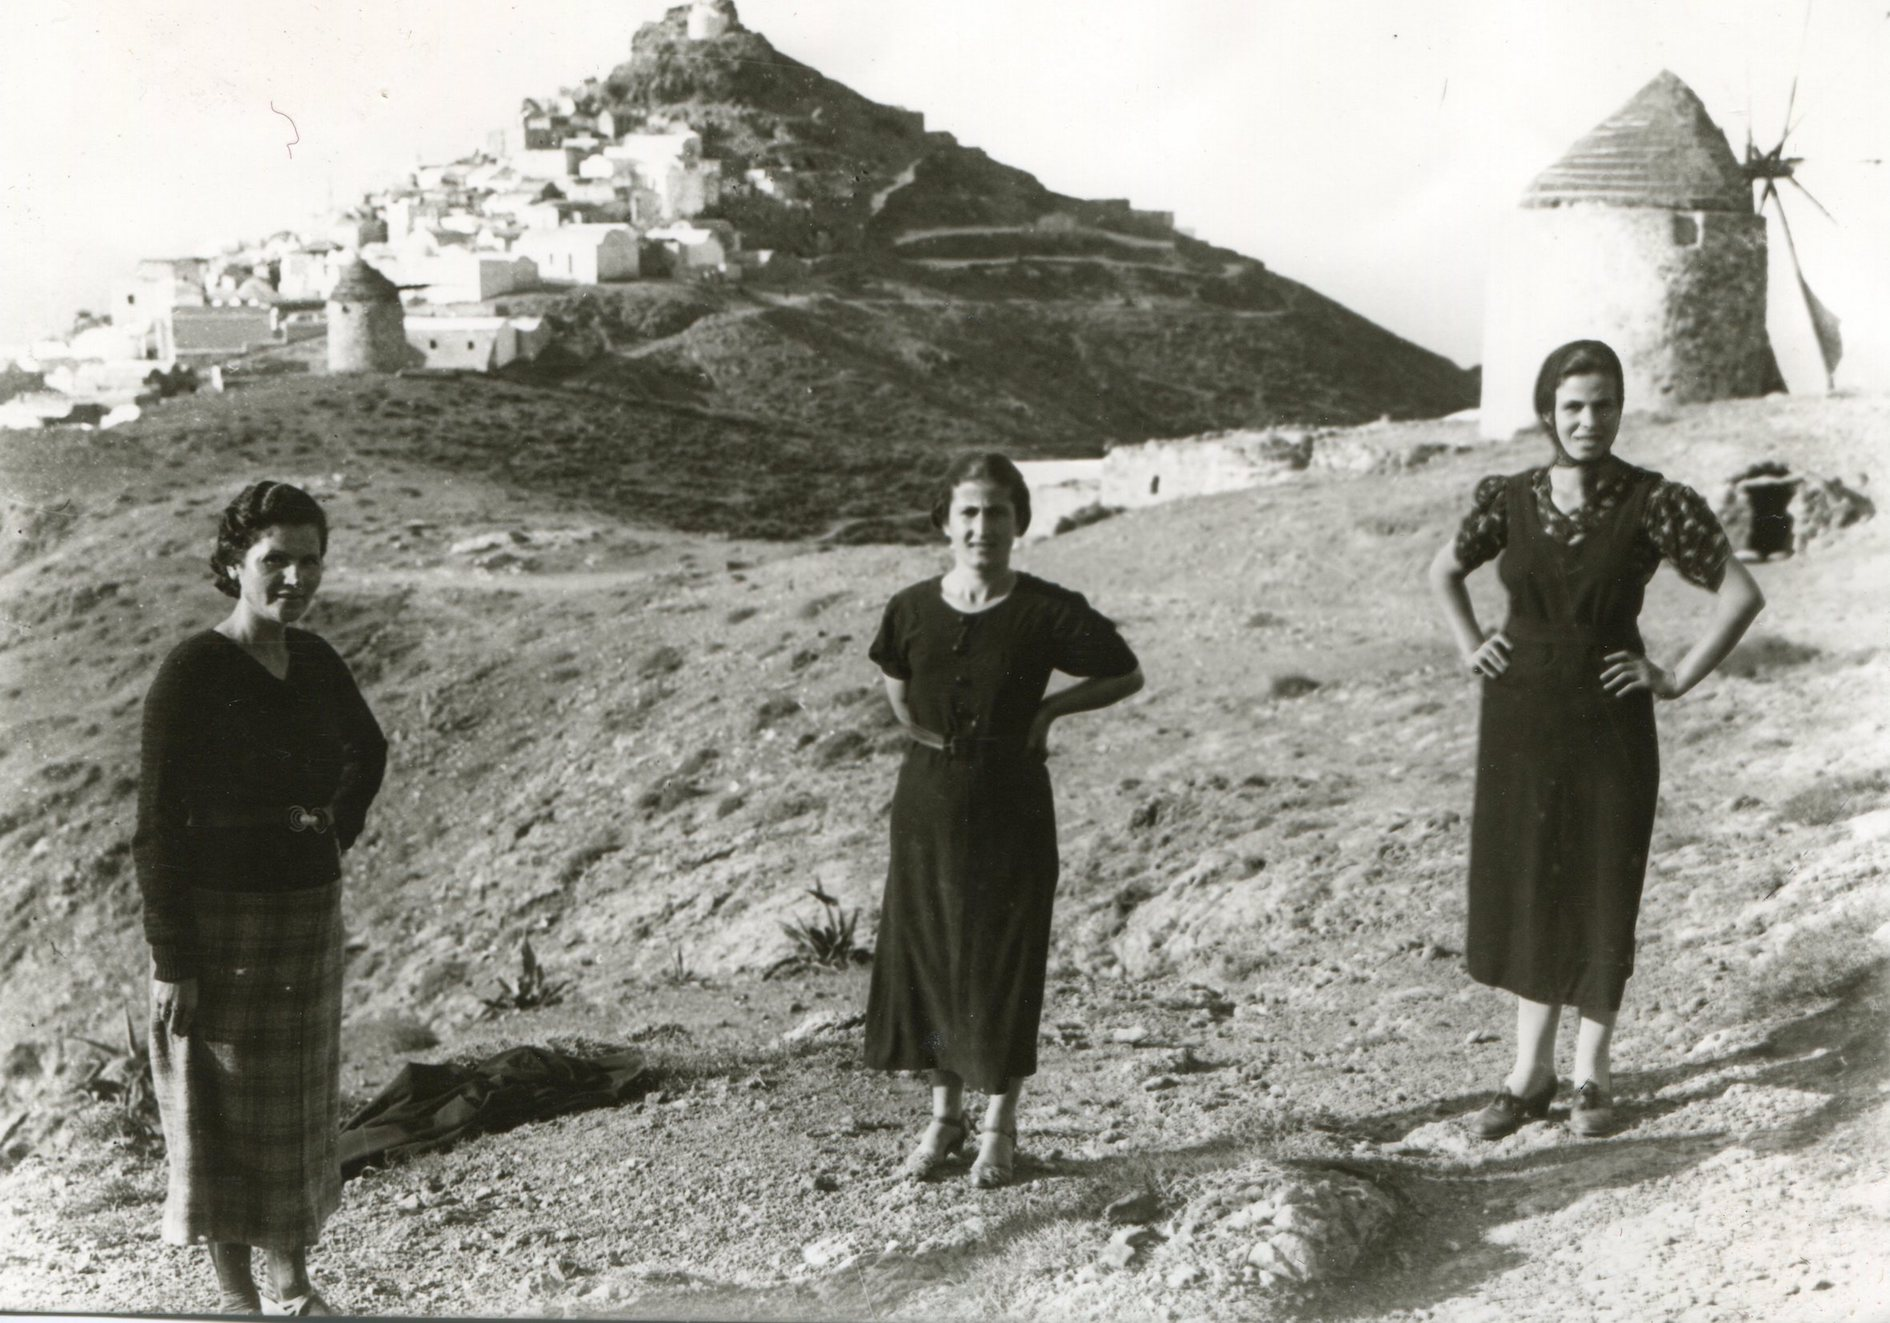 Weaving Histories: Margaret Kenna and Anafi